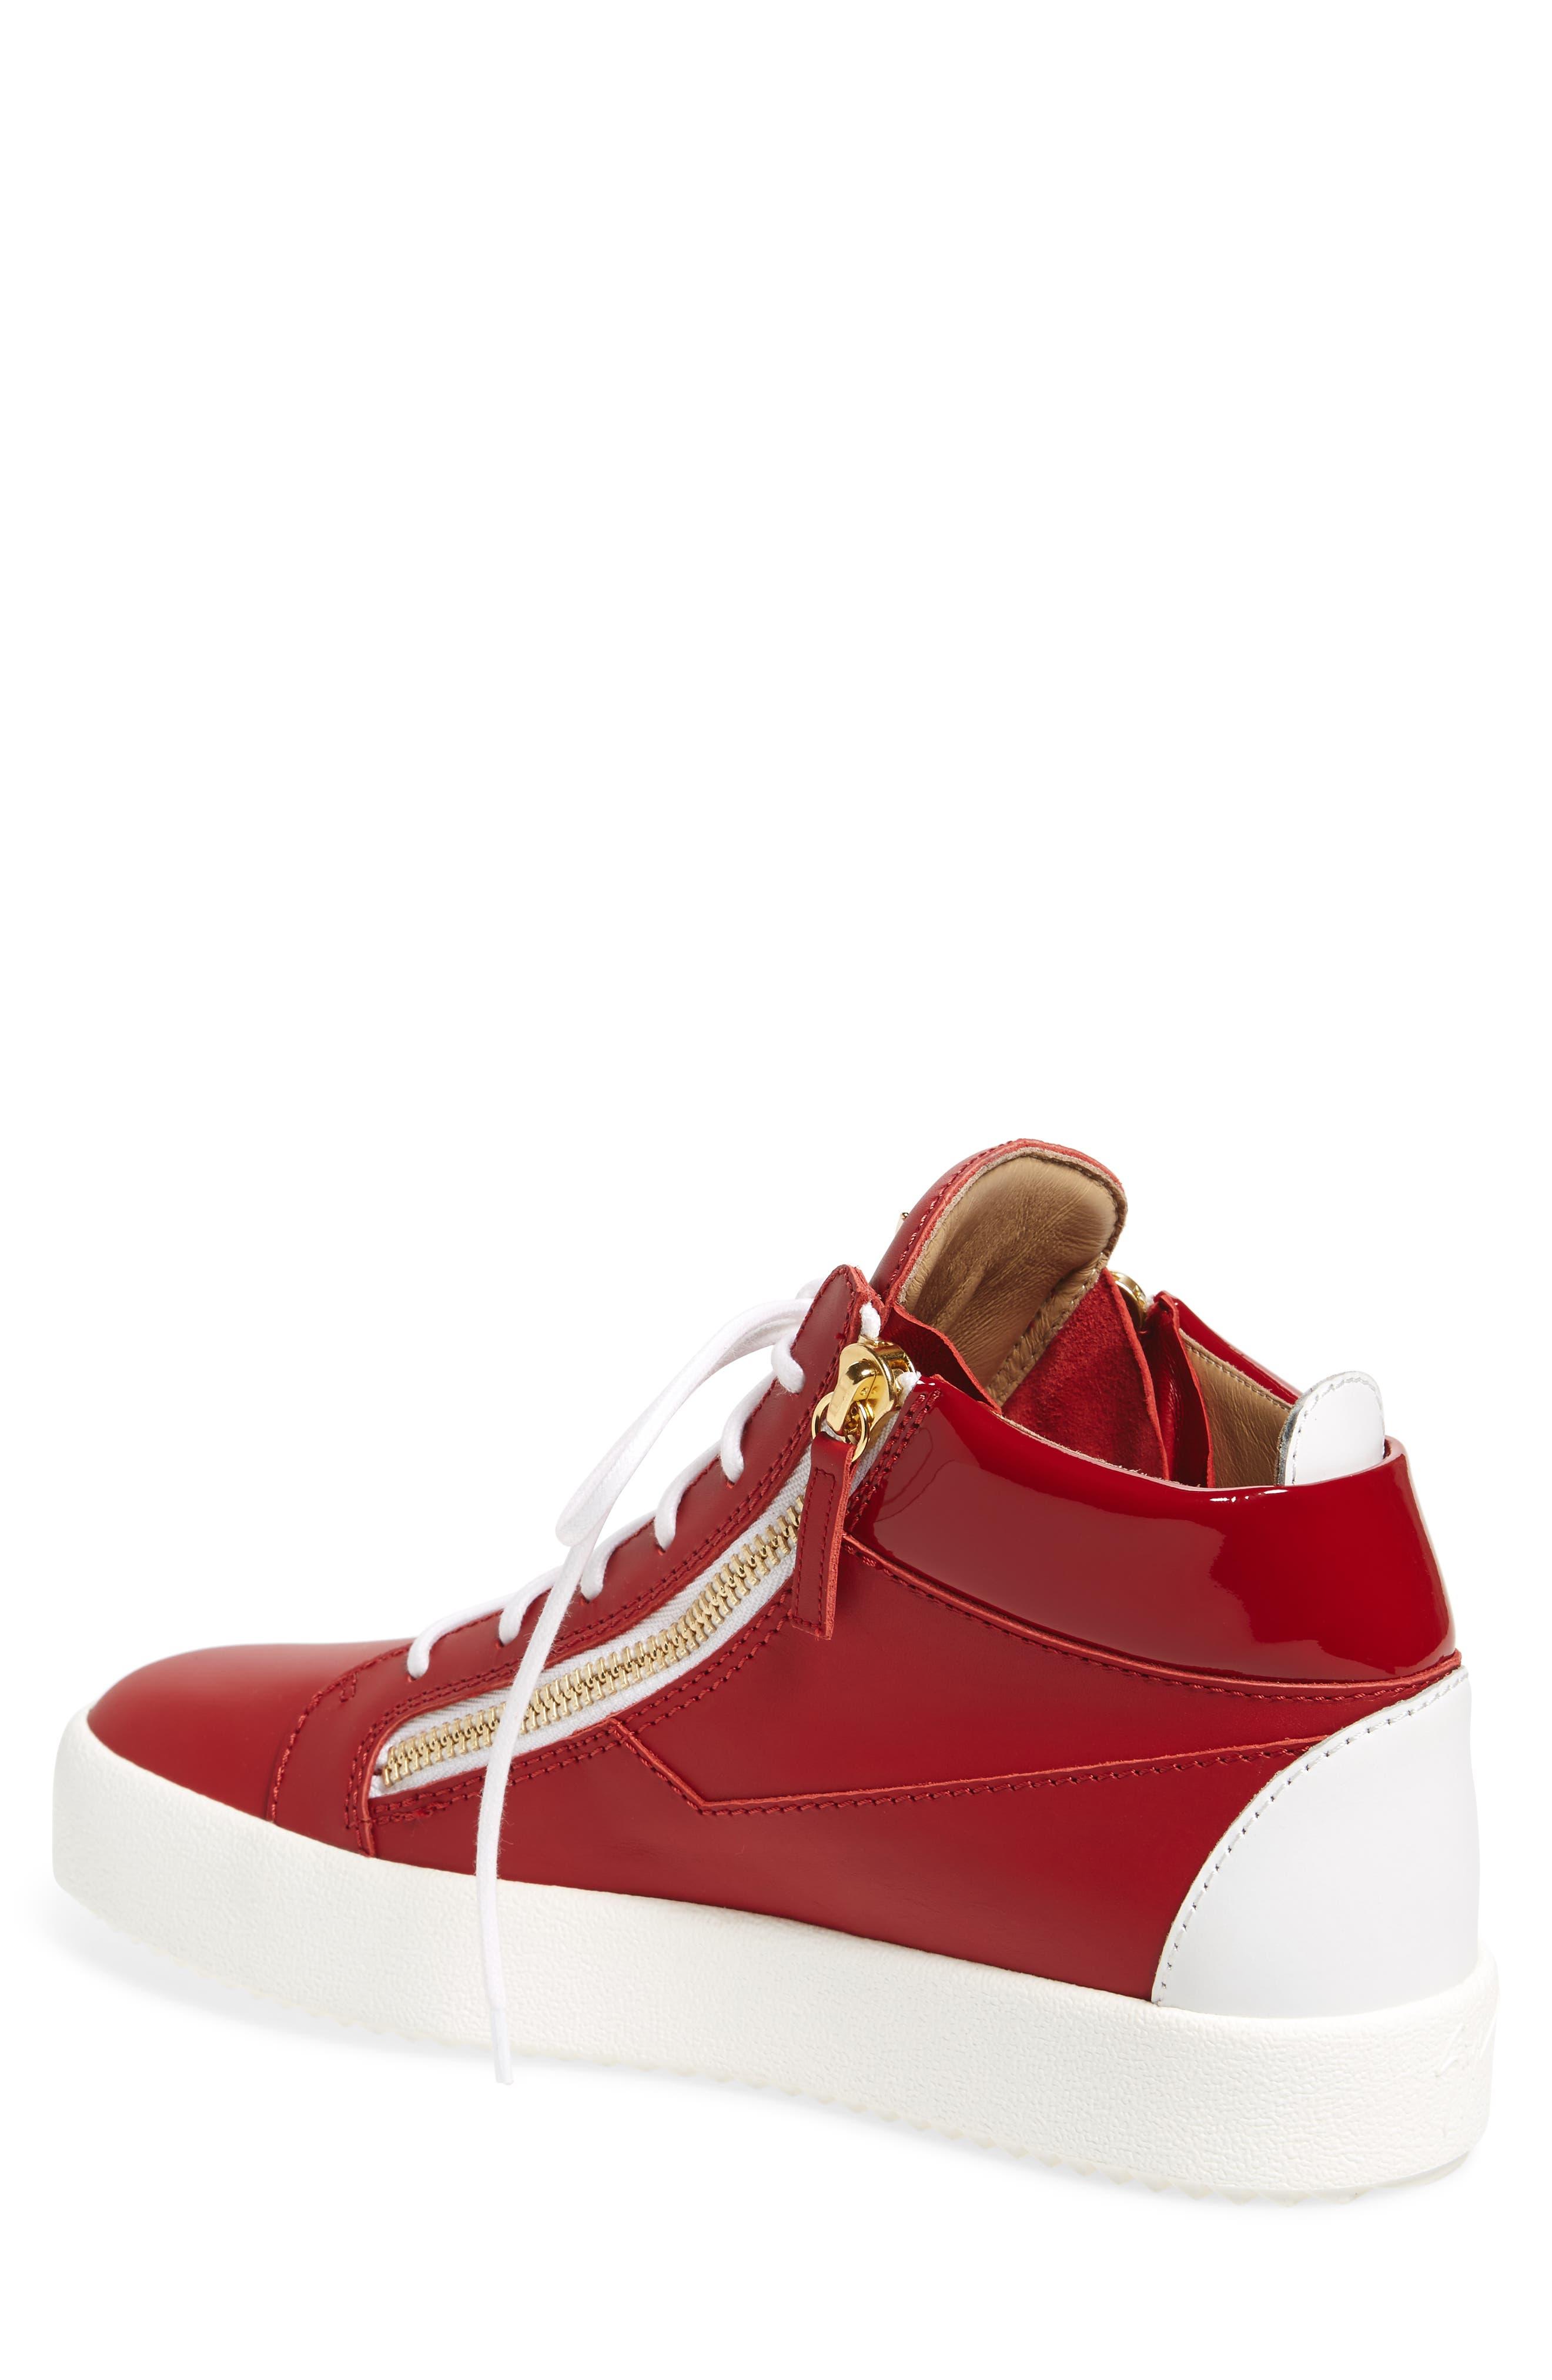 Double Zipper Mid Top Sneaker,                             Alternate thumbnail 2, color,                             600